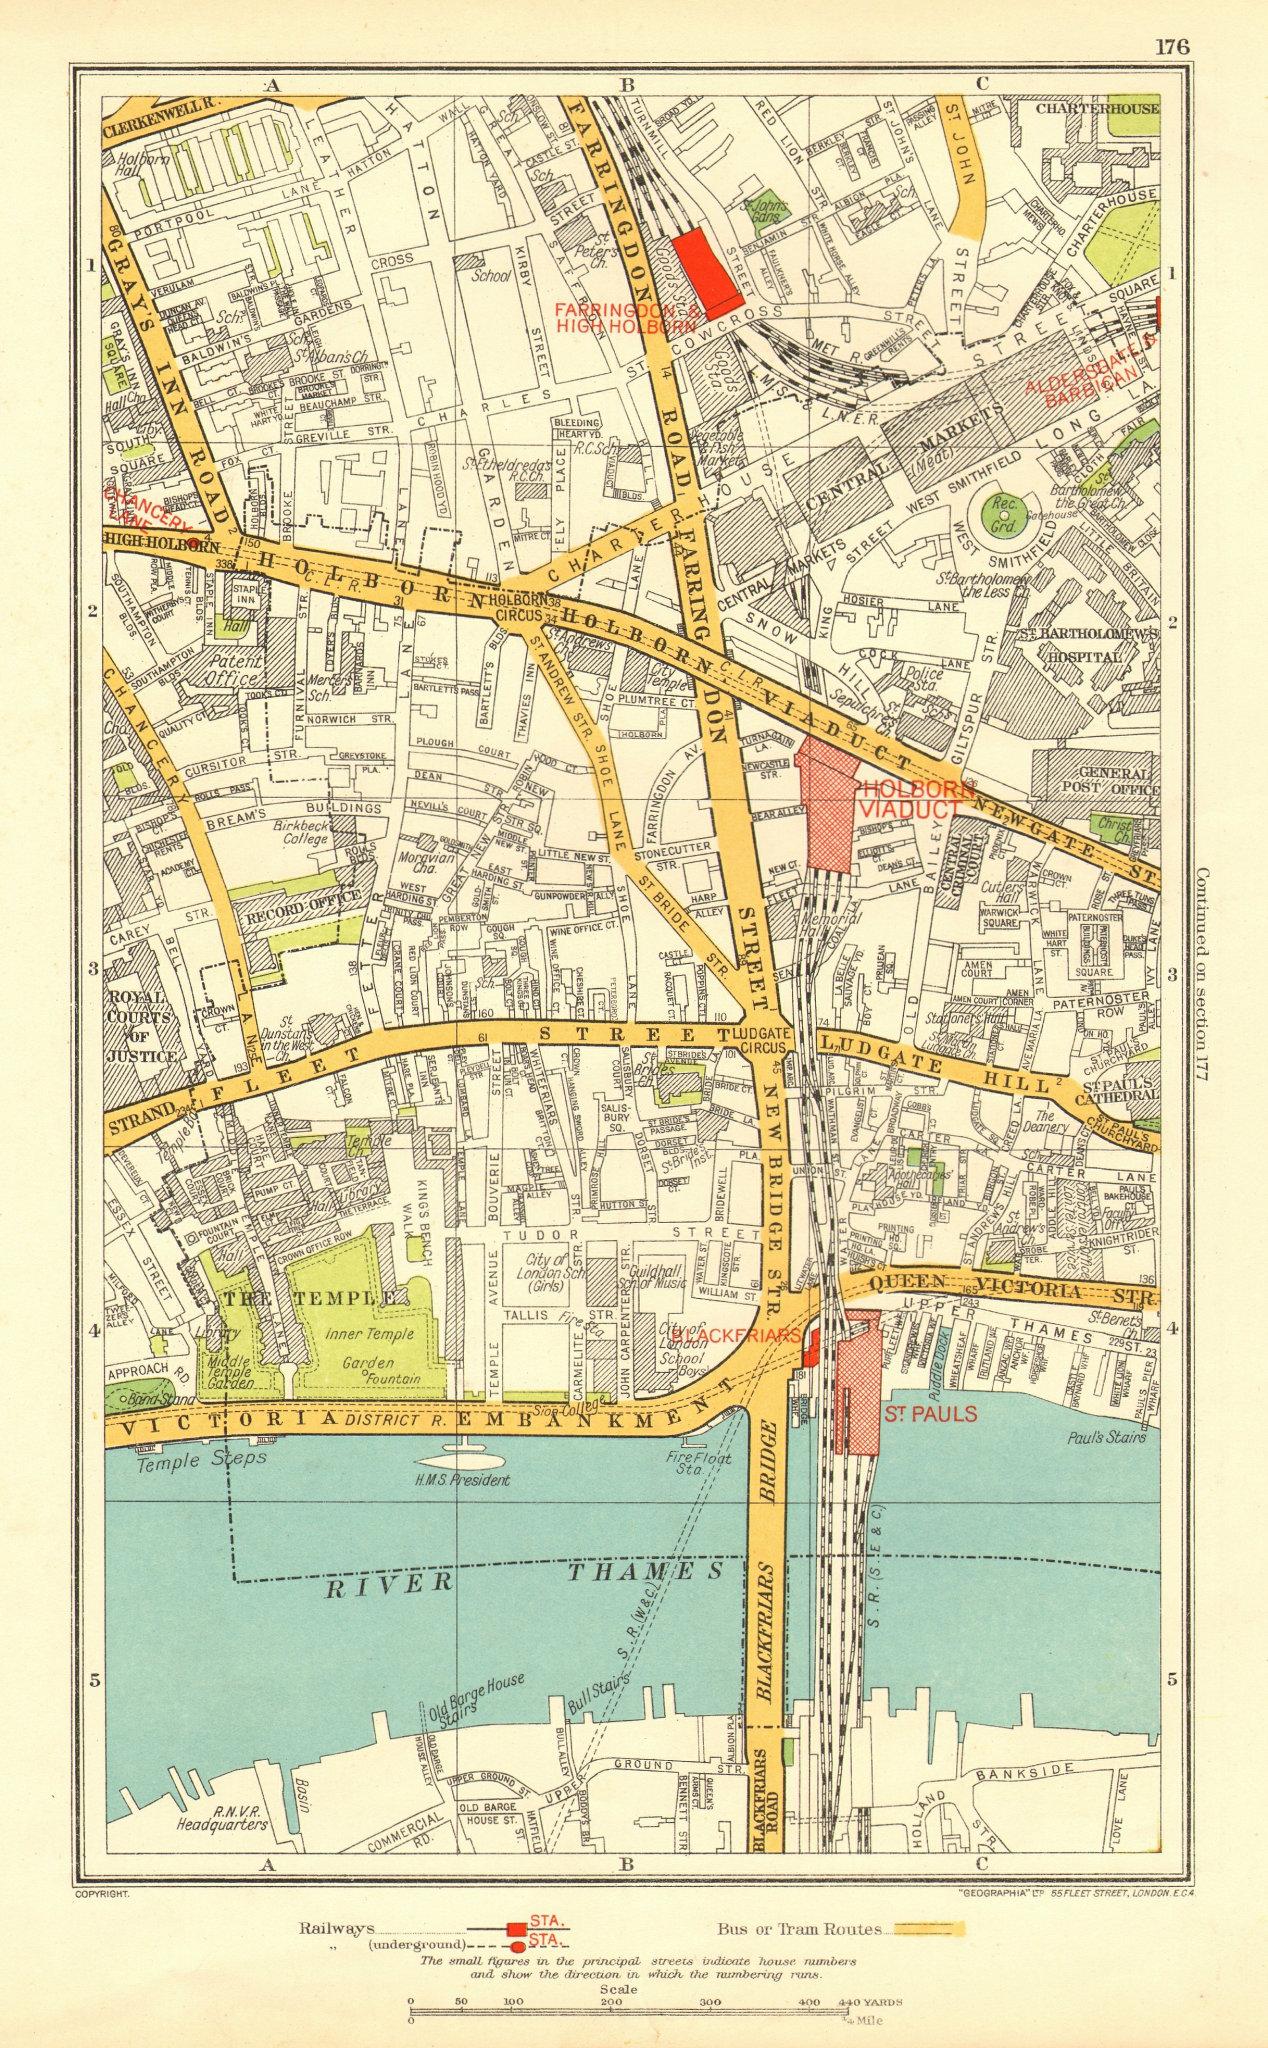 Associate Product LONDON. Holborn Farringdon Fleet St Chancery Lane 1937 old vintage map chart